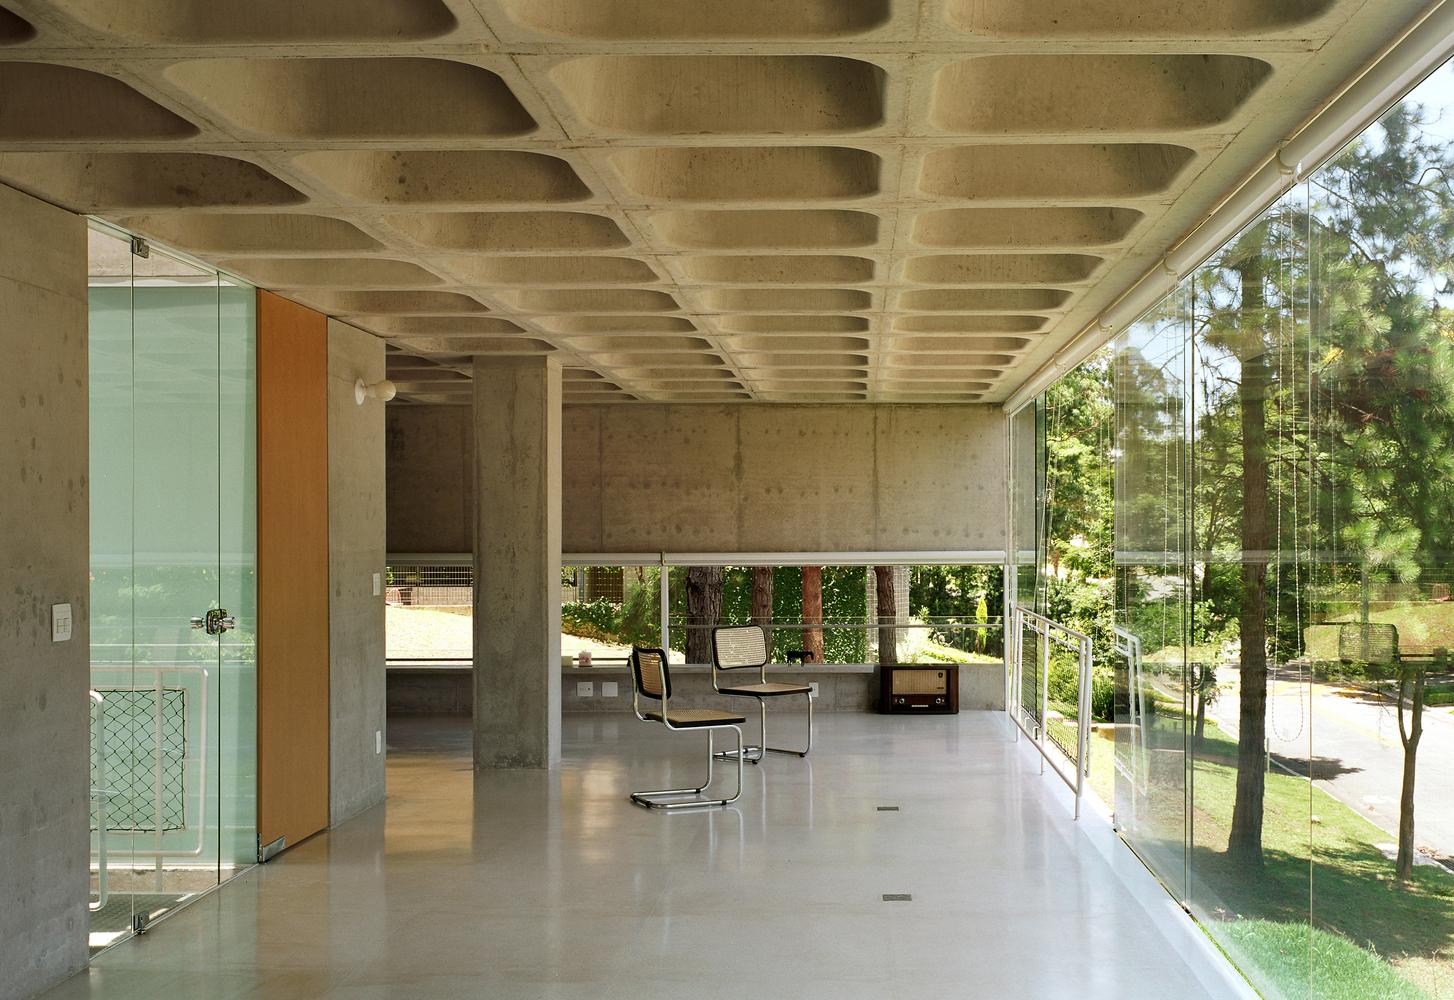 Tipos de encofrados para moldear el hormigón visto,Casa na Aldeia da Serra / MMBB Arquitetos + SPBR Arquitetos. Image © Nelson Kon